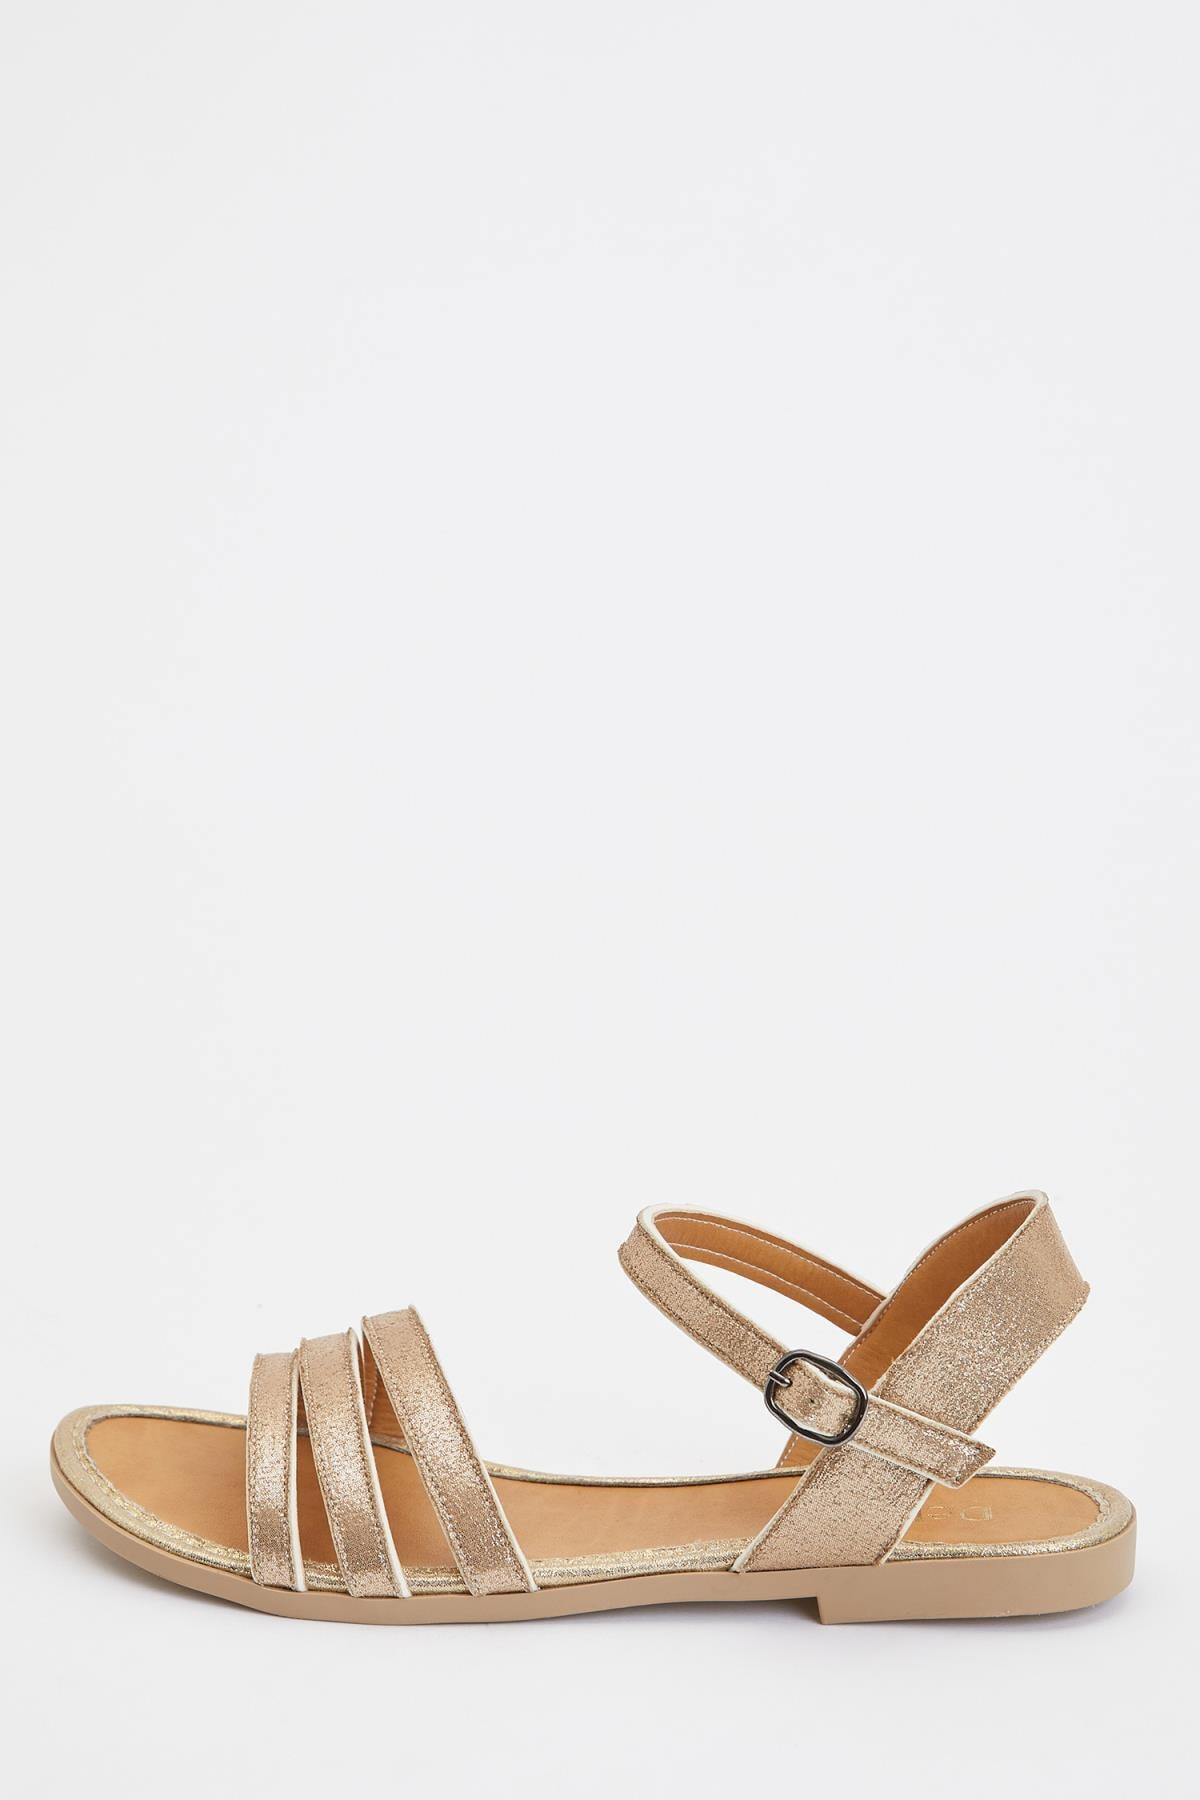 DeFacto Kadın Altın Fashion Sandalet S5927AZ20SM